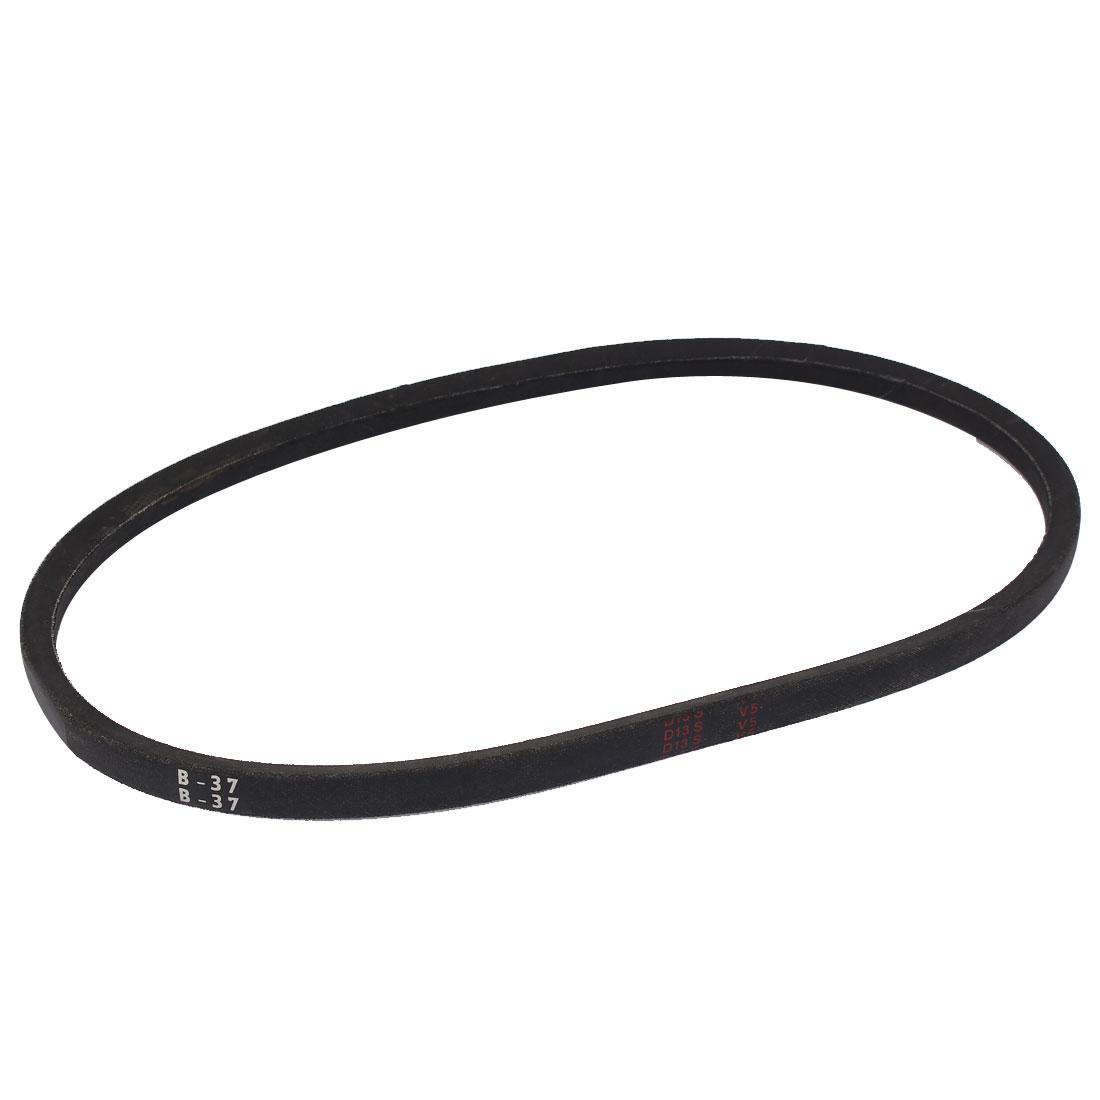 "B37 37"" x 0.67"" Industrial Machine Rubber Drive Belt V-Belt"